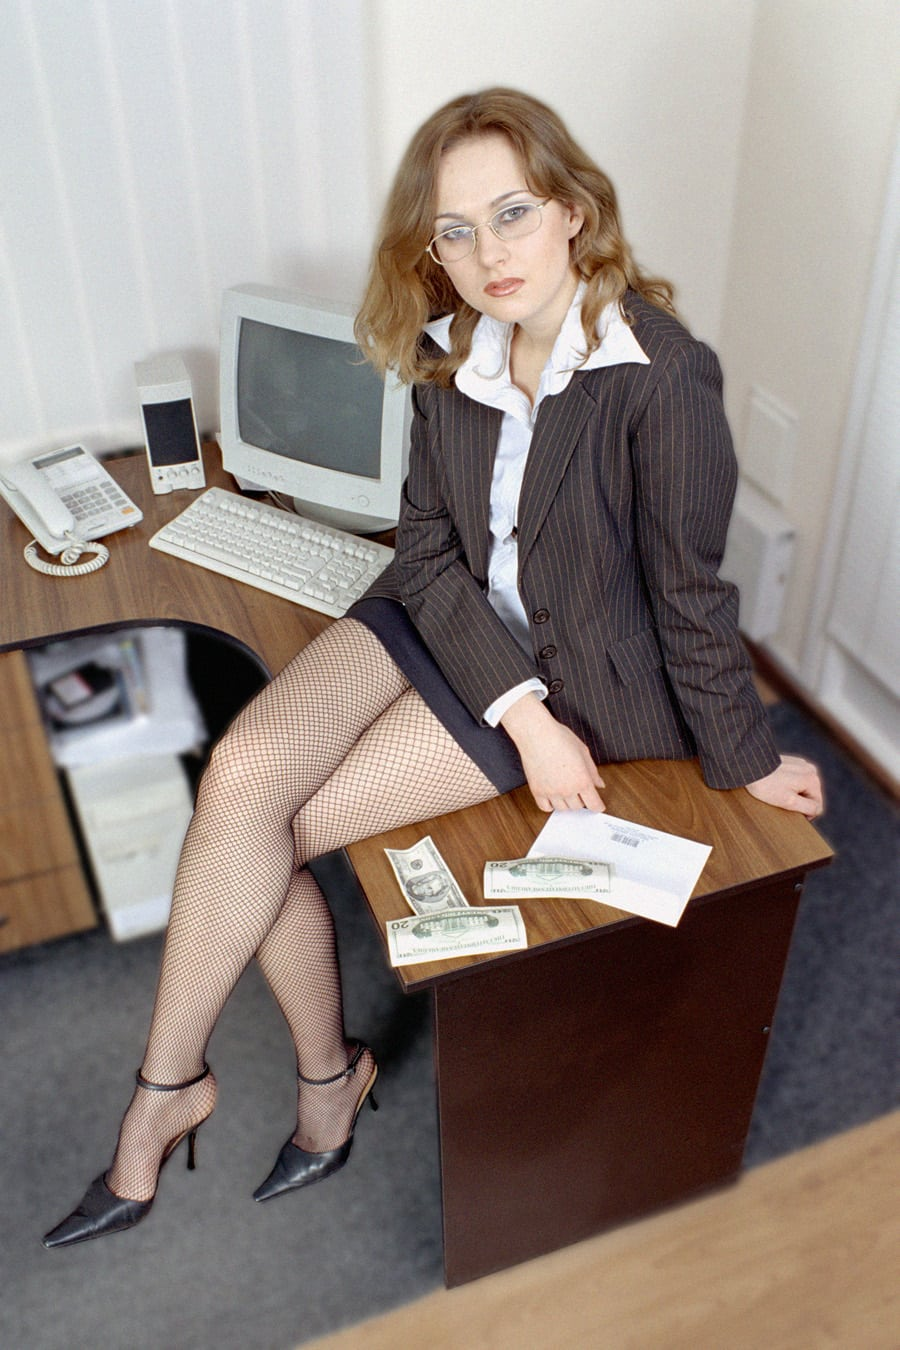 Yes WordPress is Sexy